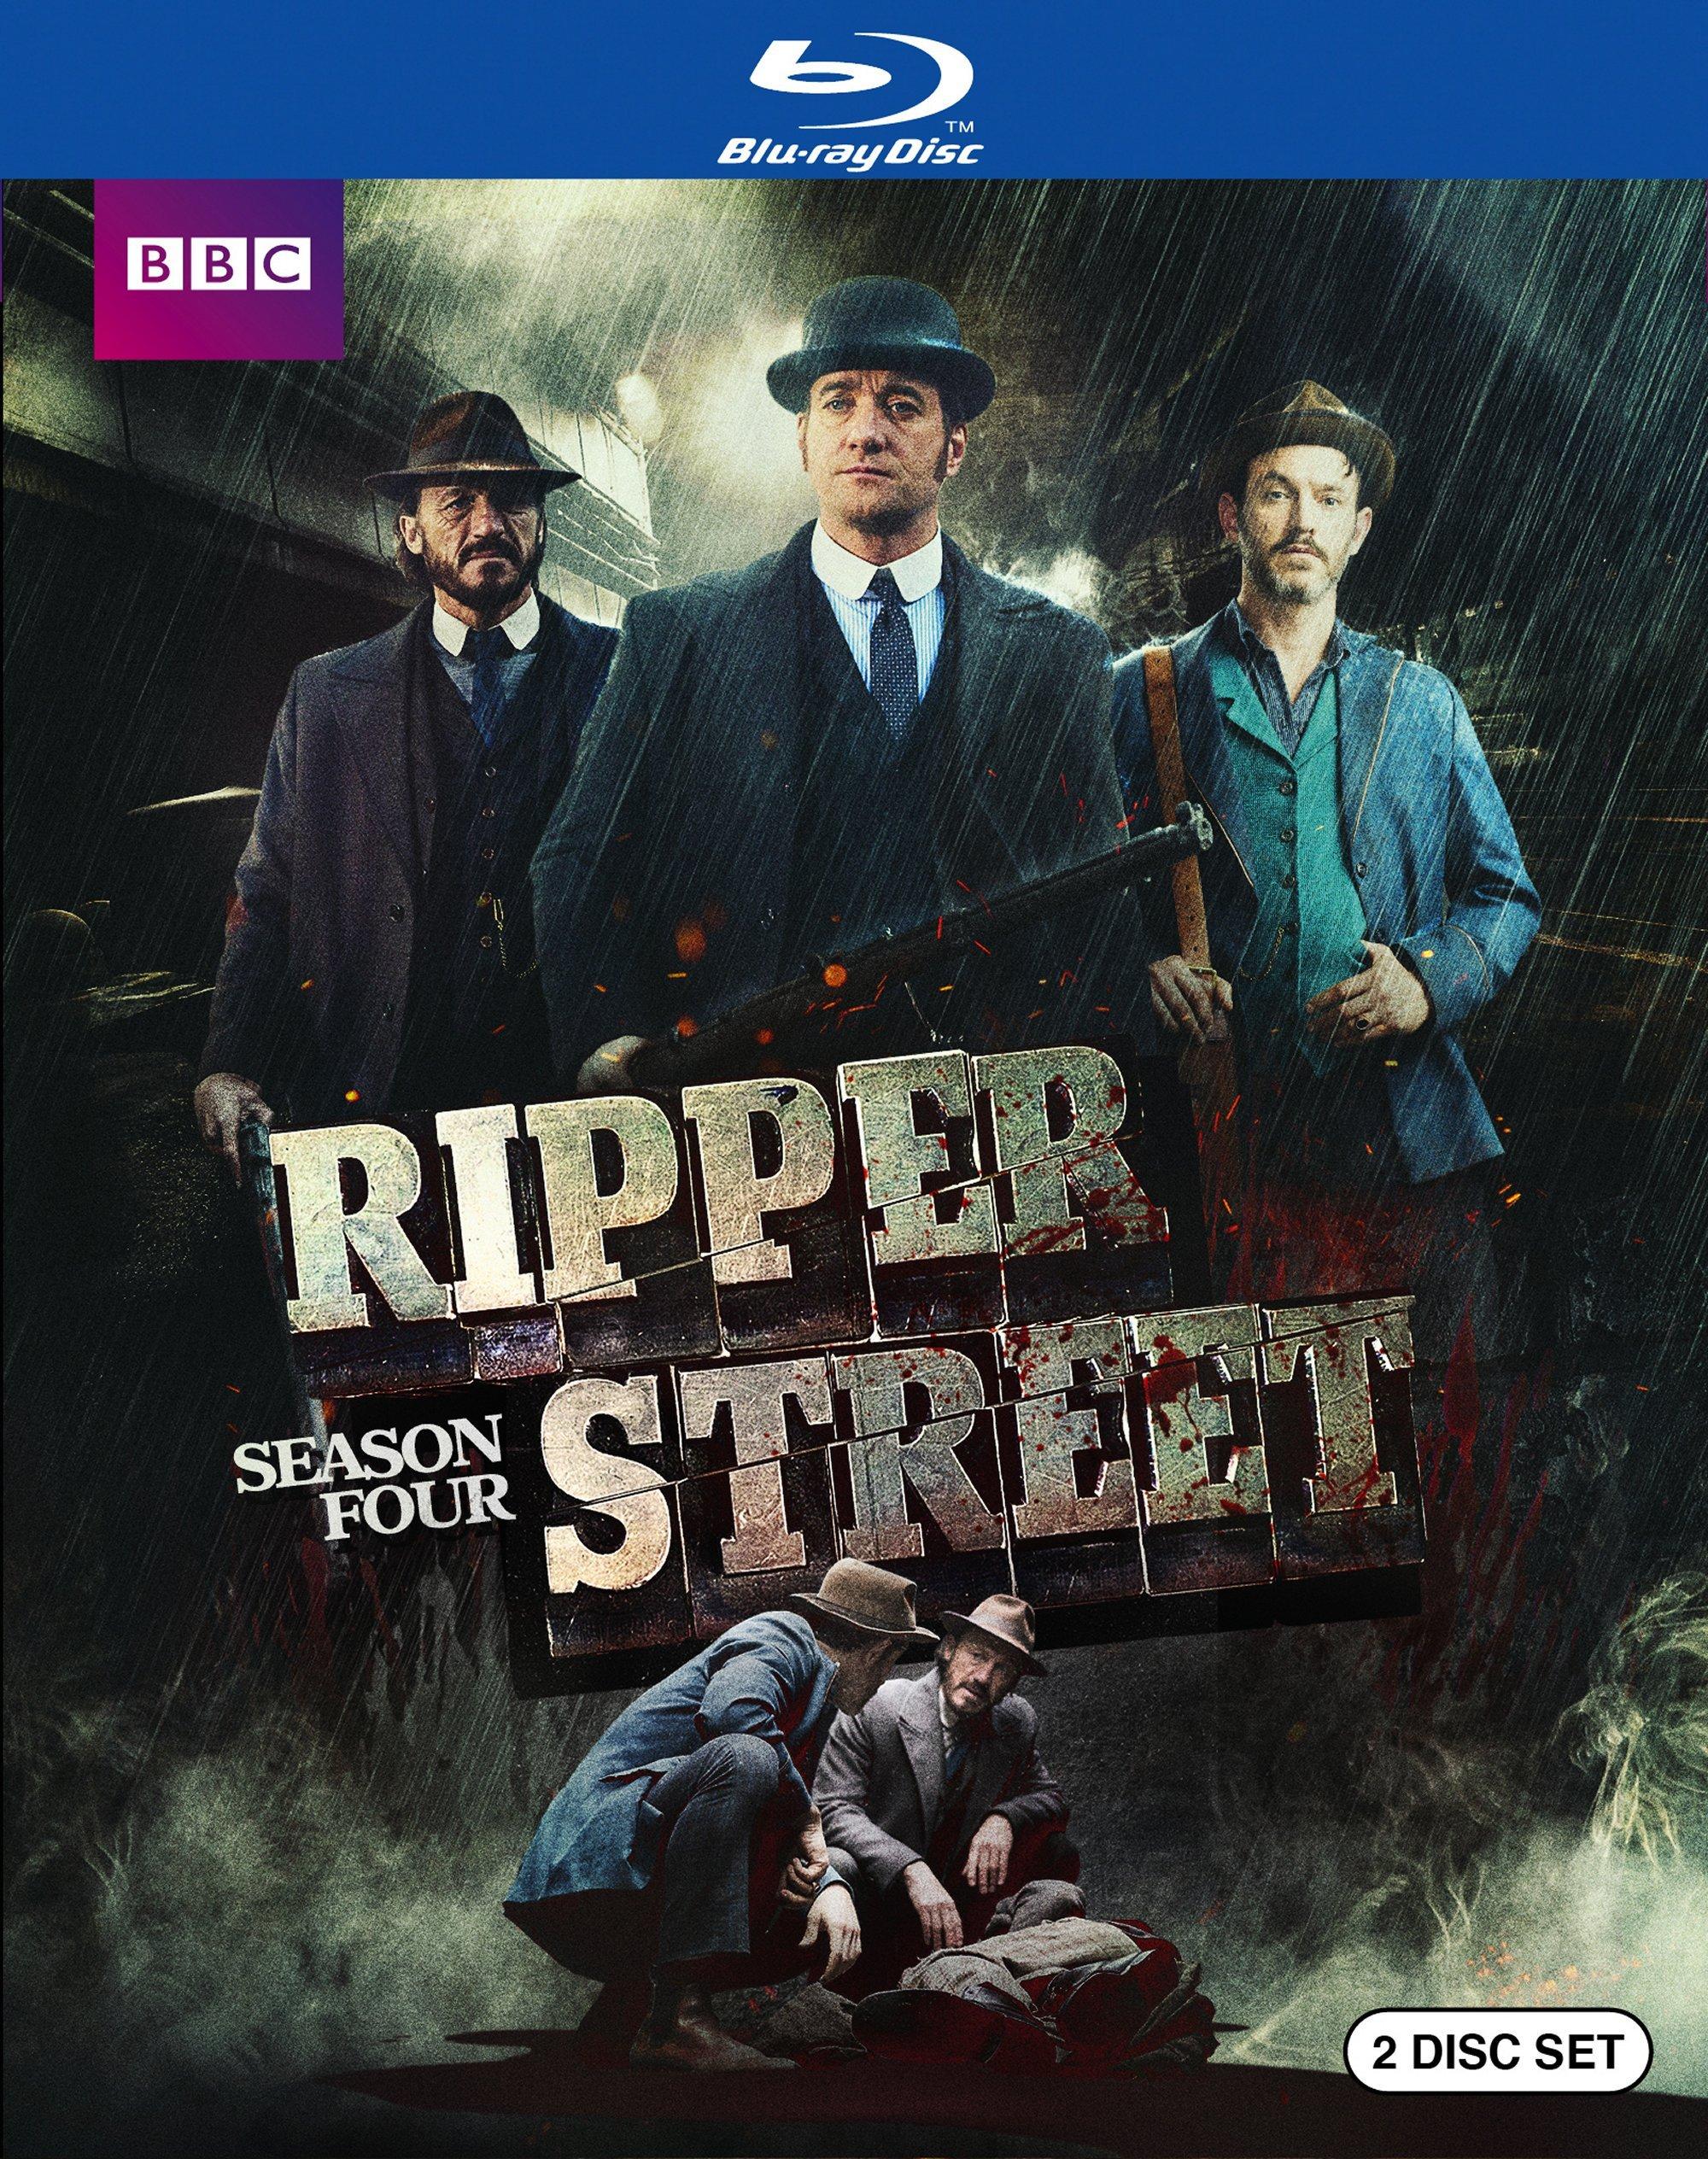 Blu-ray : Ripper Street: Season Four (2 Disc)